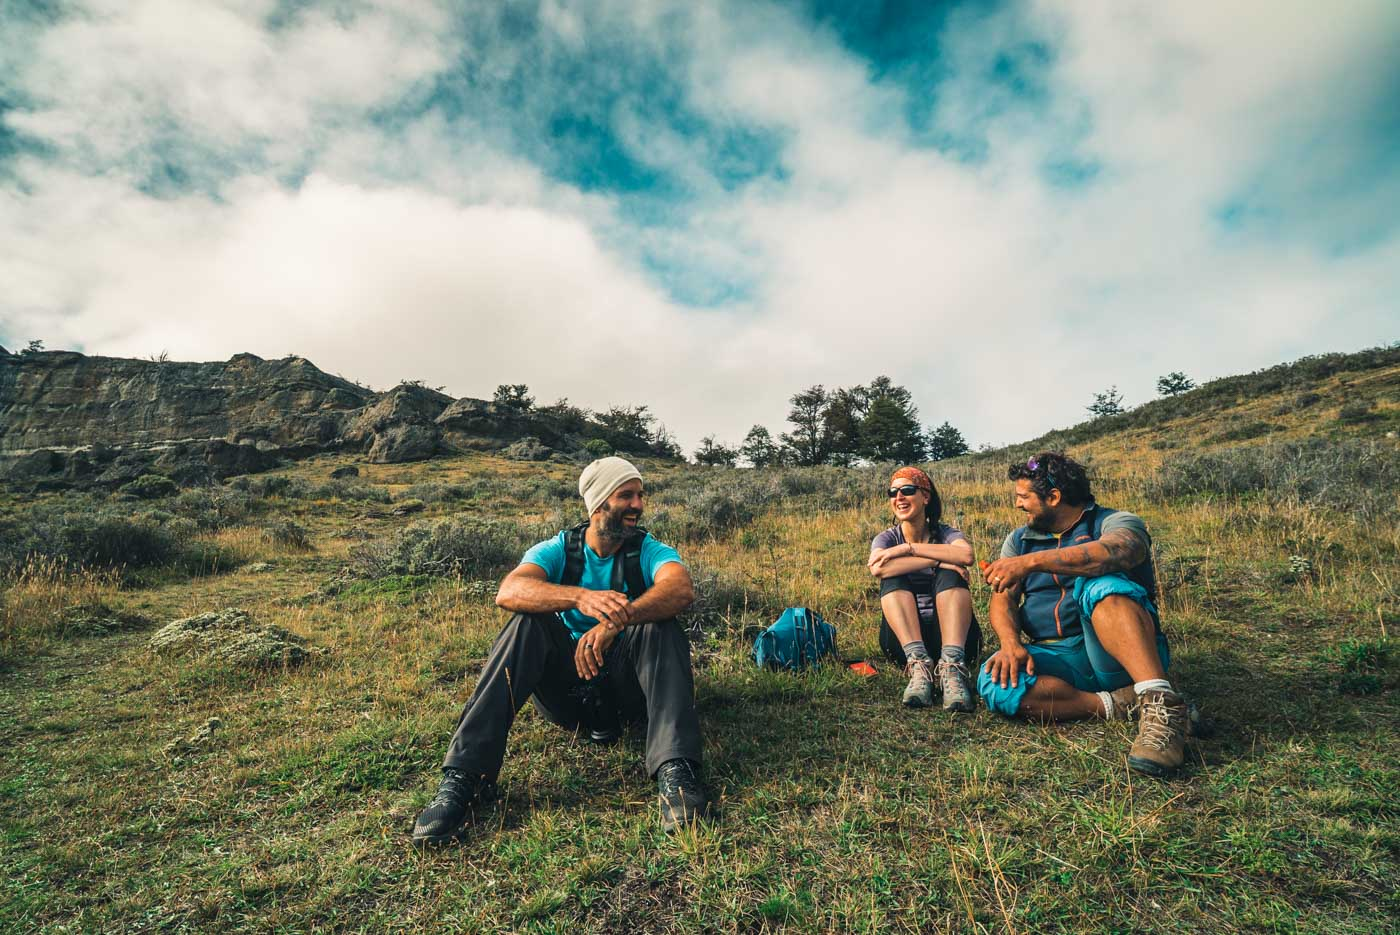 Max, Nili and Felipe enjoying a break on the slopes of Cerro Queso at Laguna Sofia